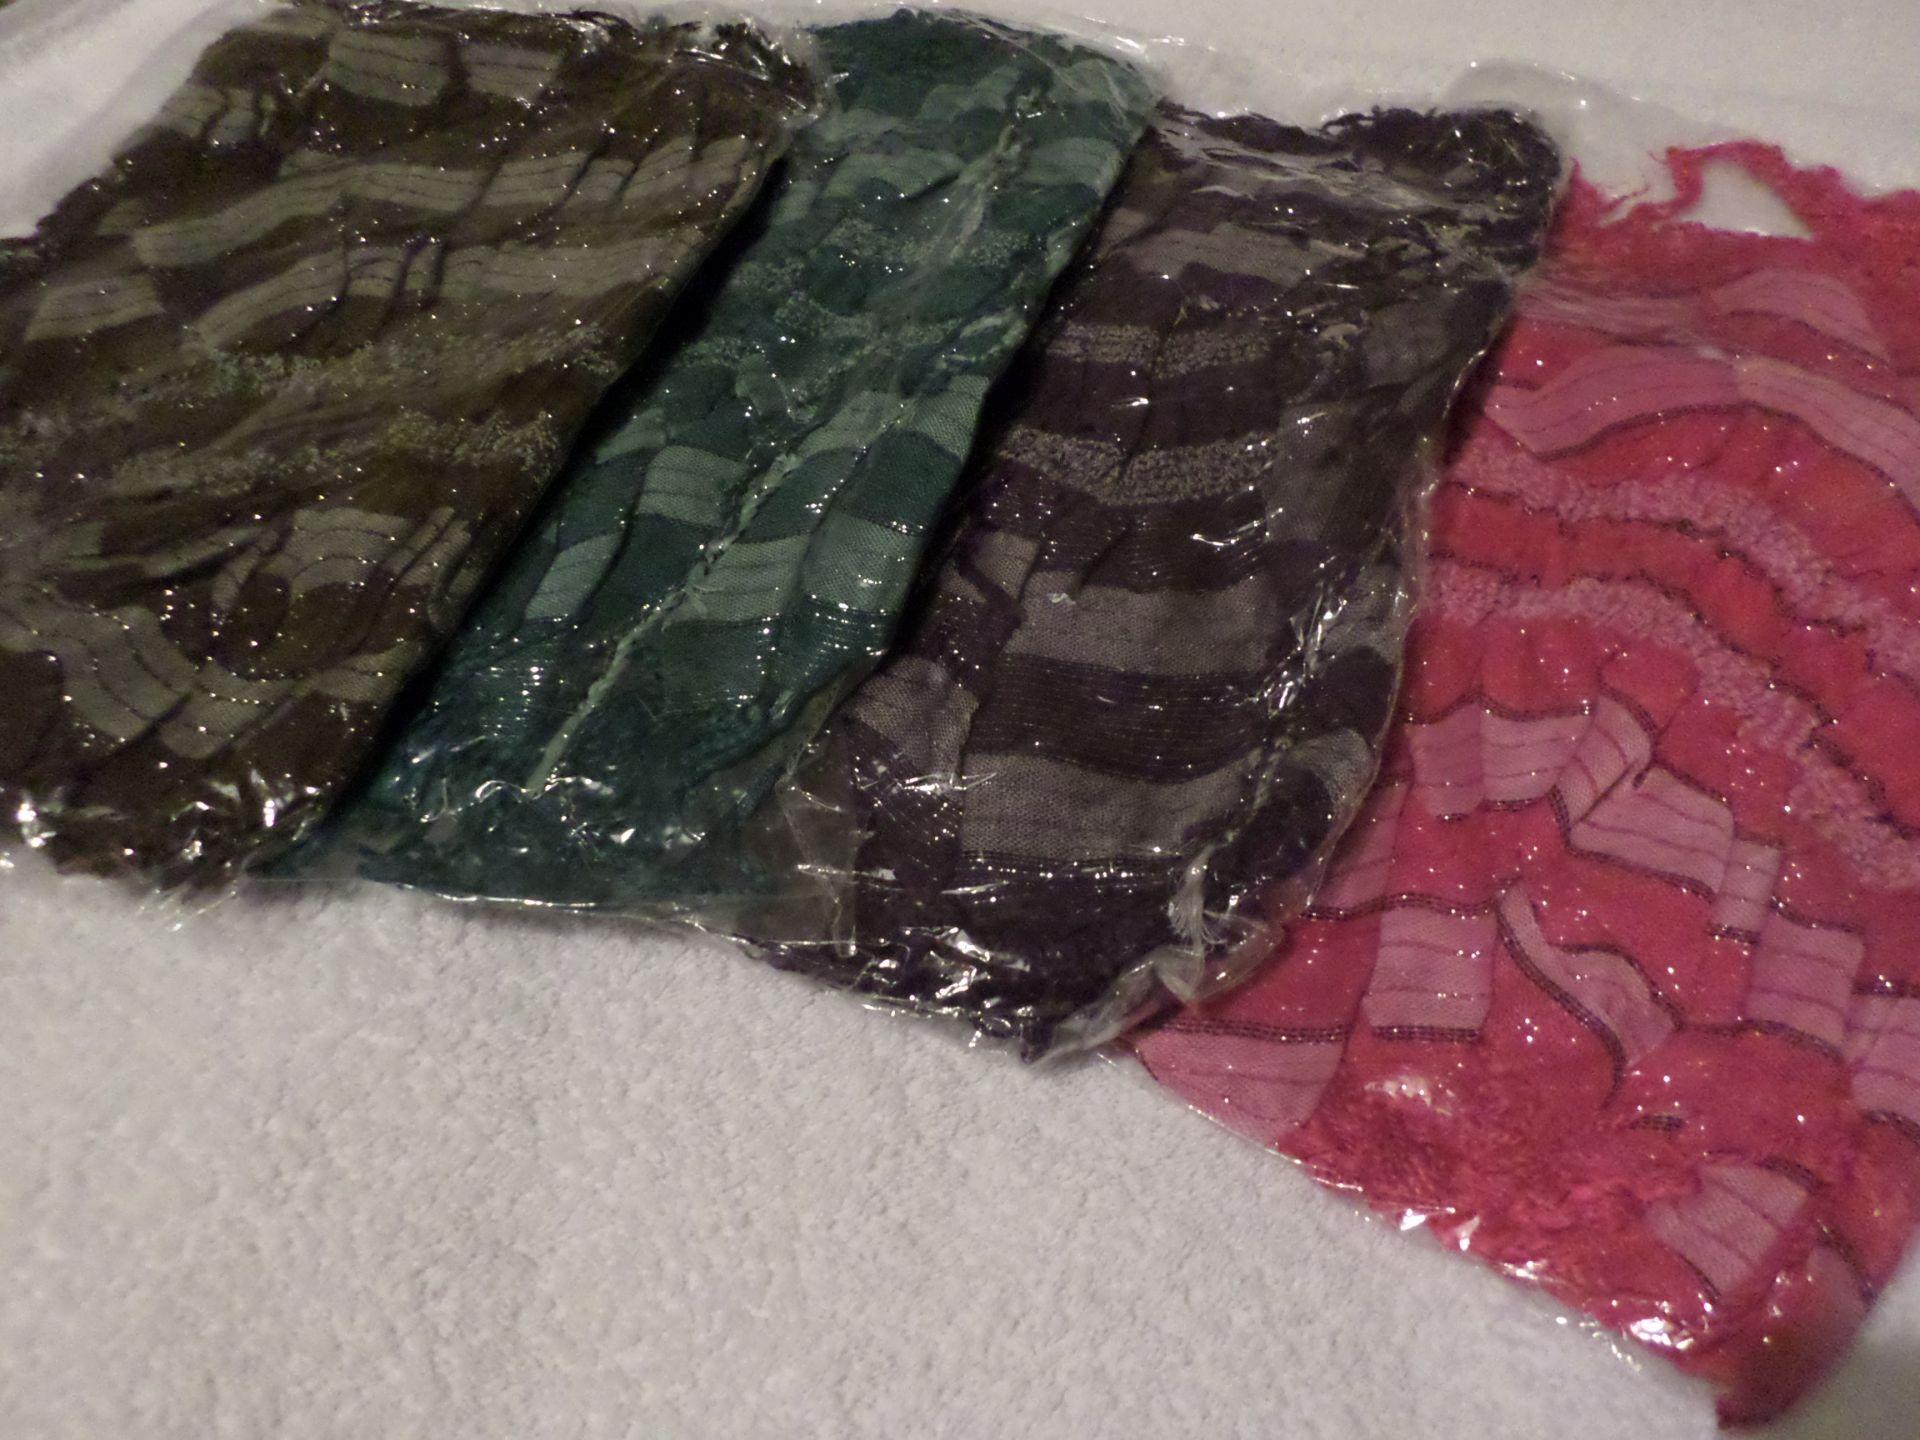 30 x Shoulder Scarves. RRP £300. Brand New - Image 2 of 2